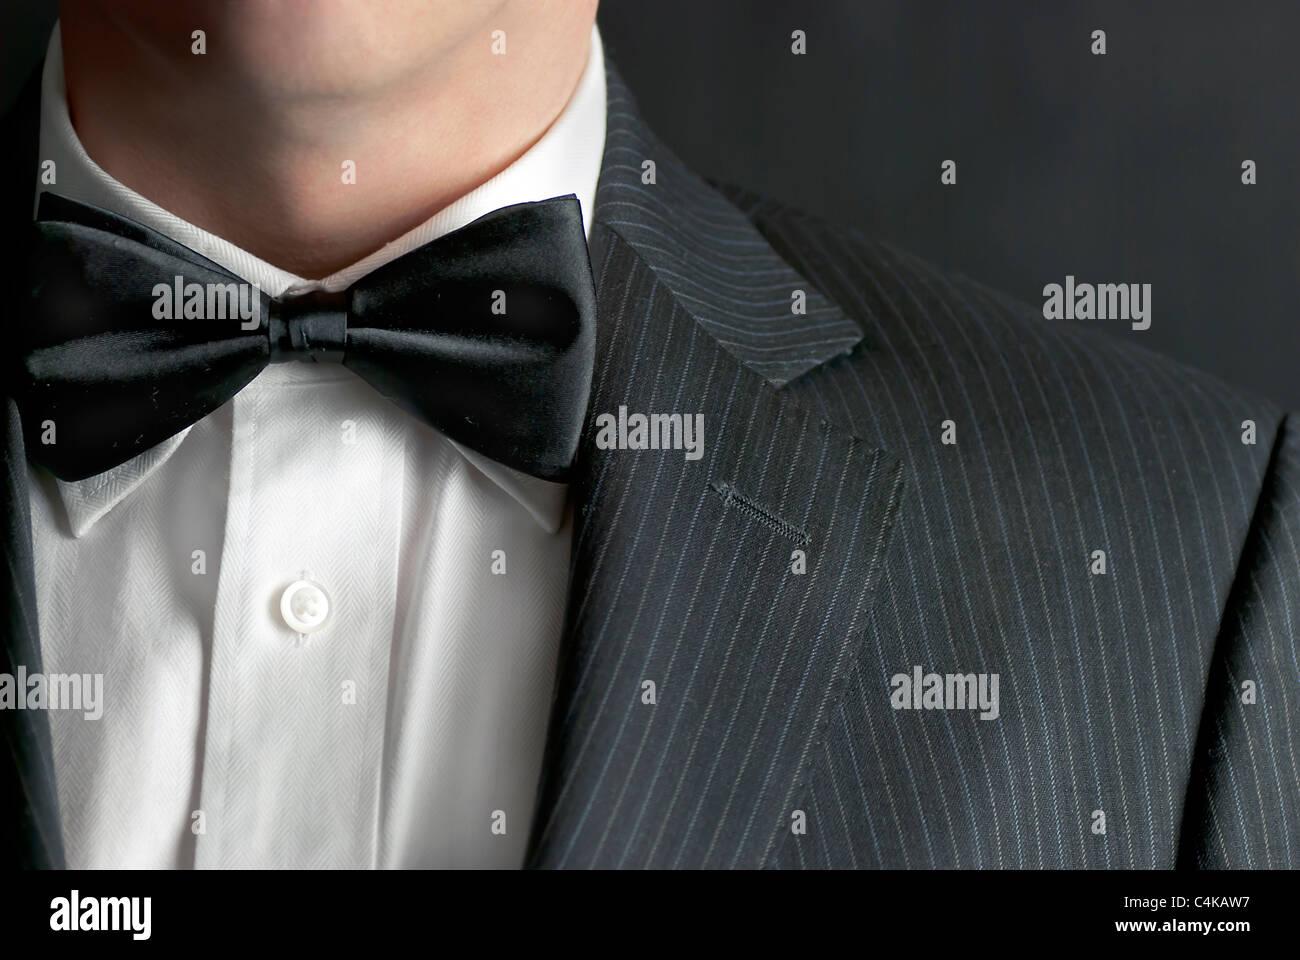 A close-up shot of a man wearing a tux. - Stock Image